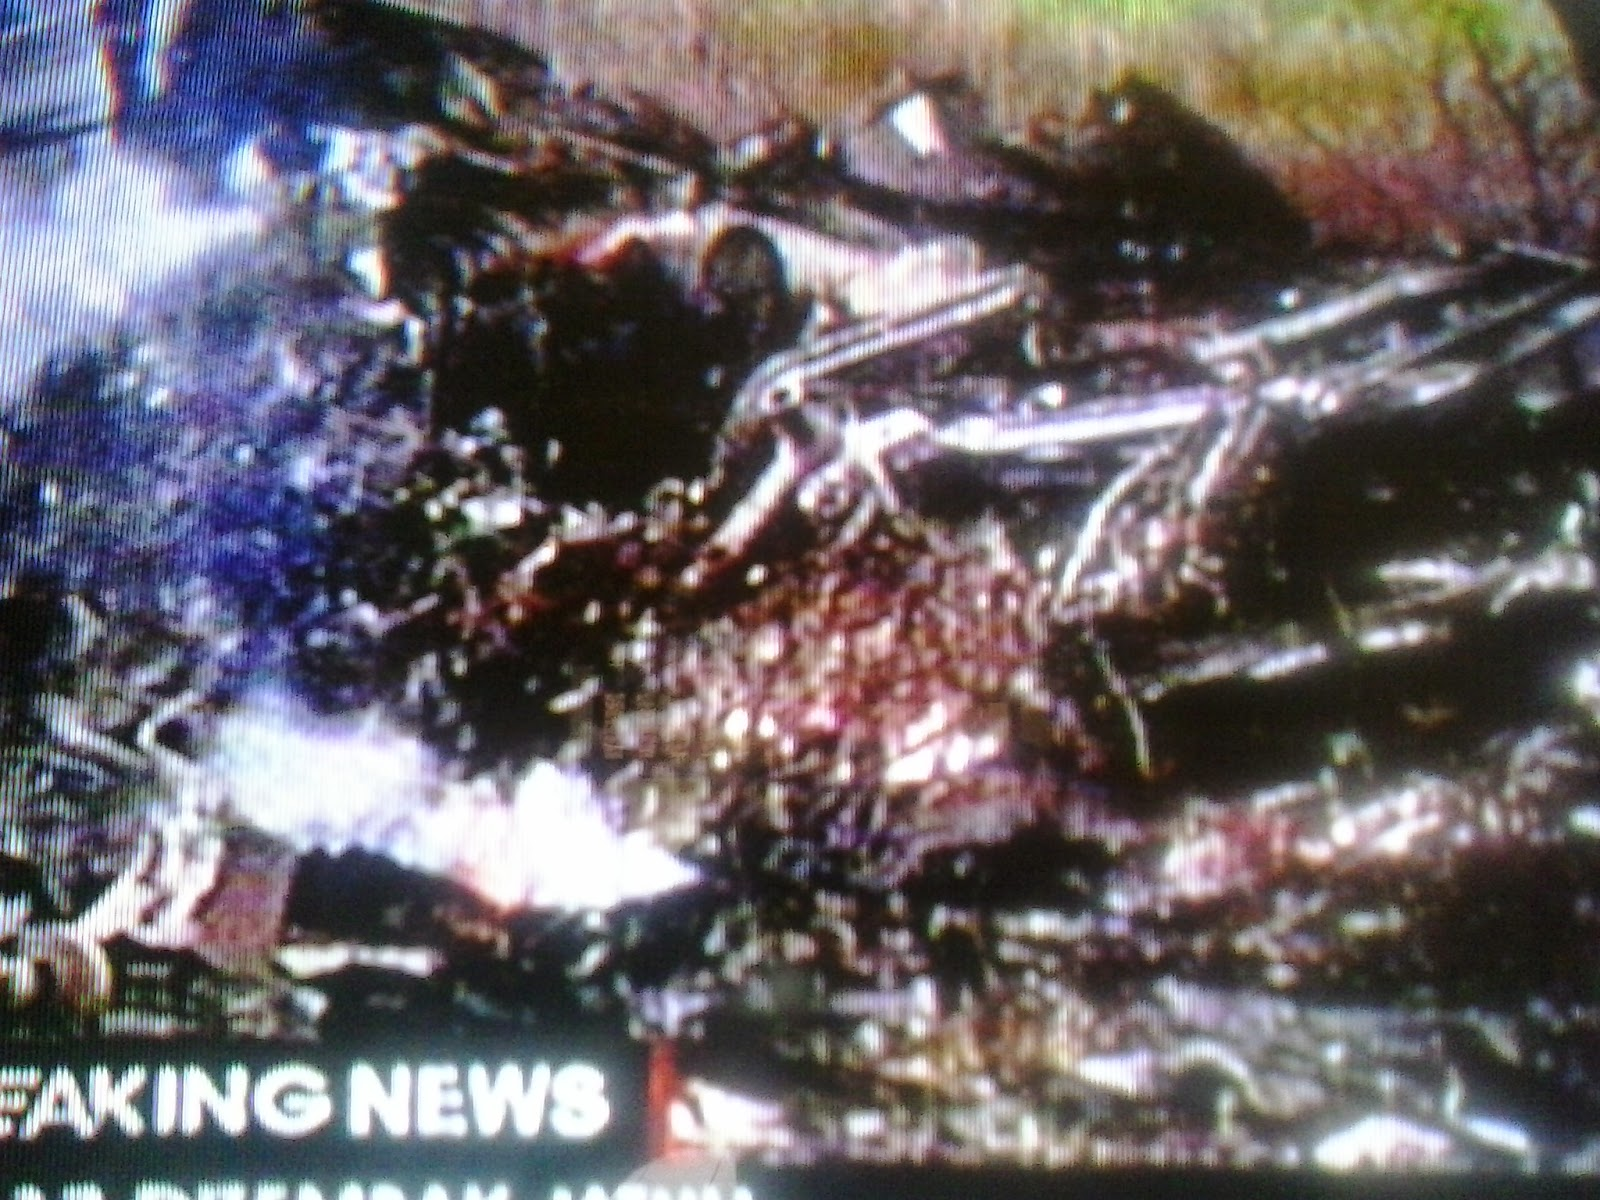 Pesawat Malaysia Airlines MH-17 ditembak jatuh di perbatasan Ukraina - Rusia